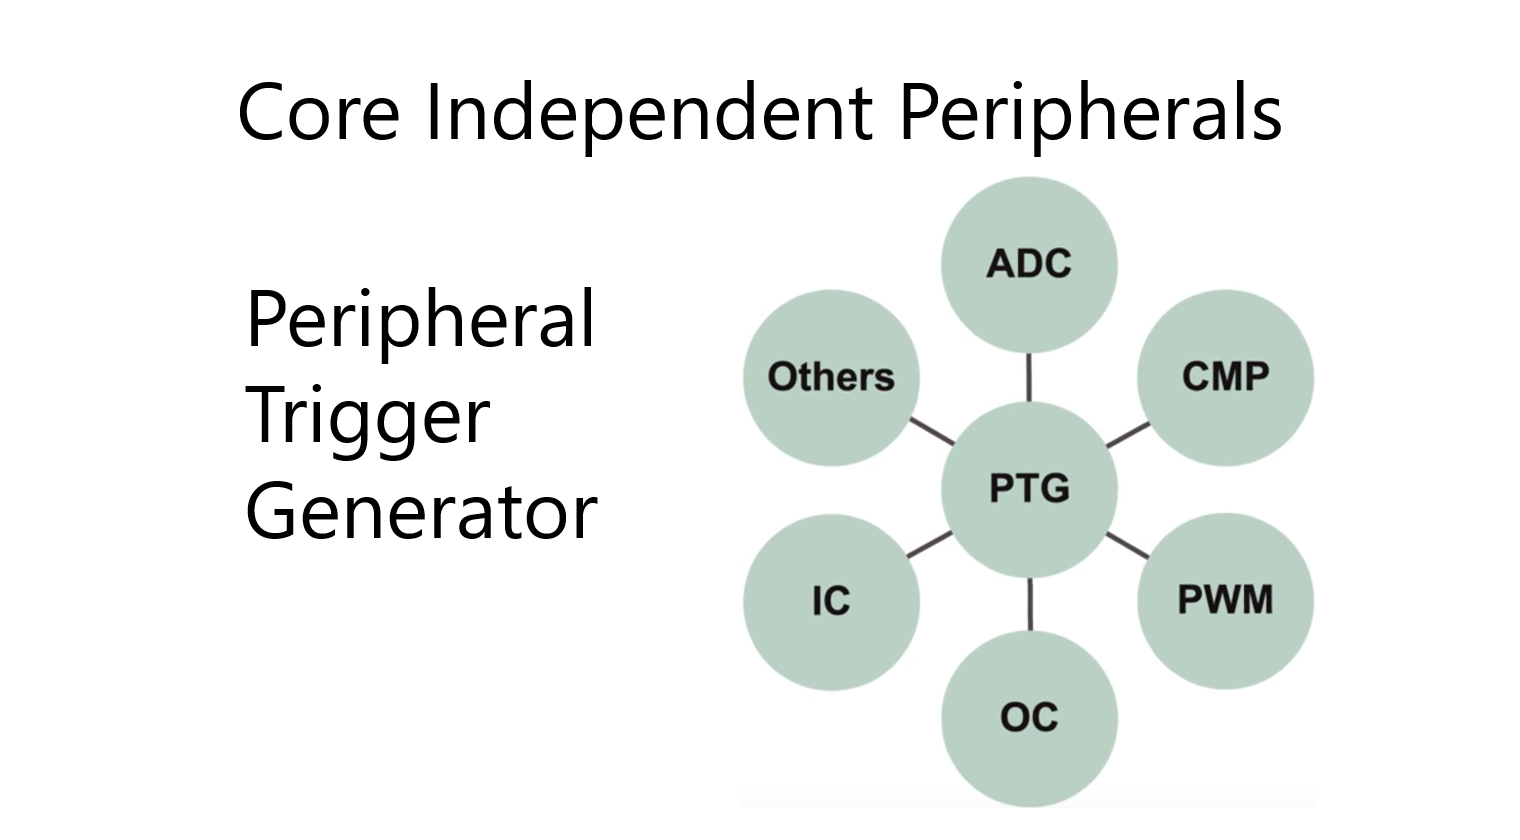 Peripheral Trigger Generator